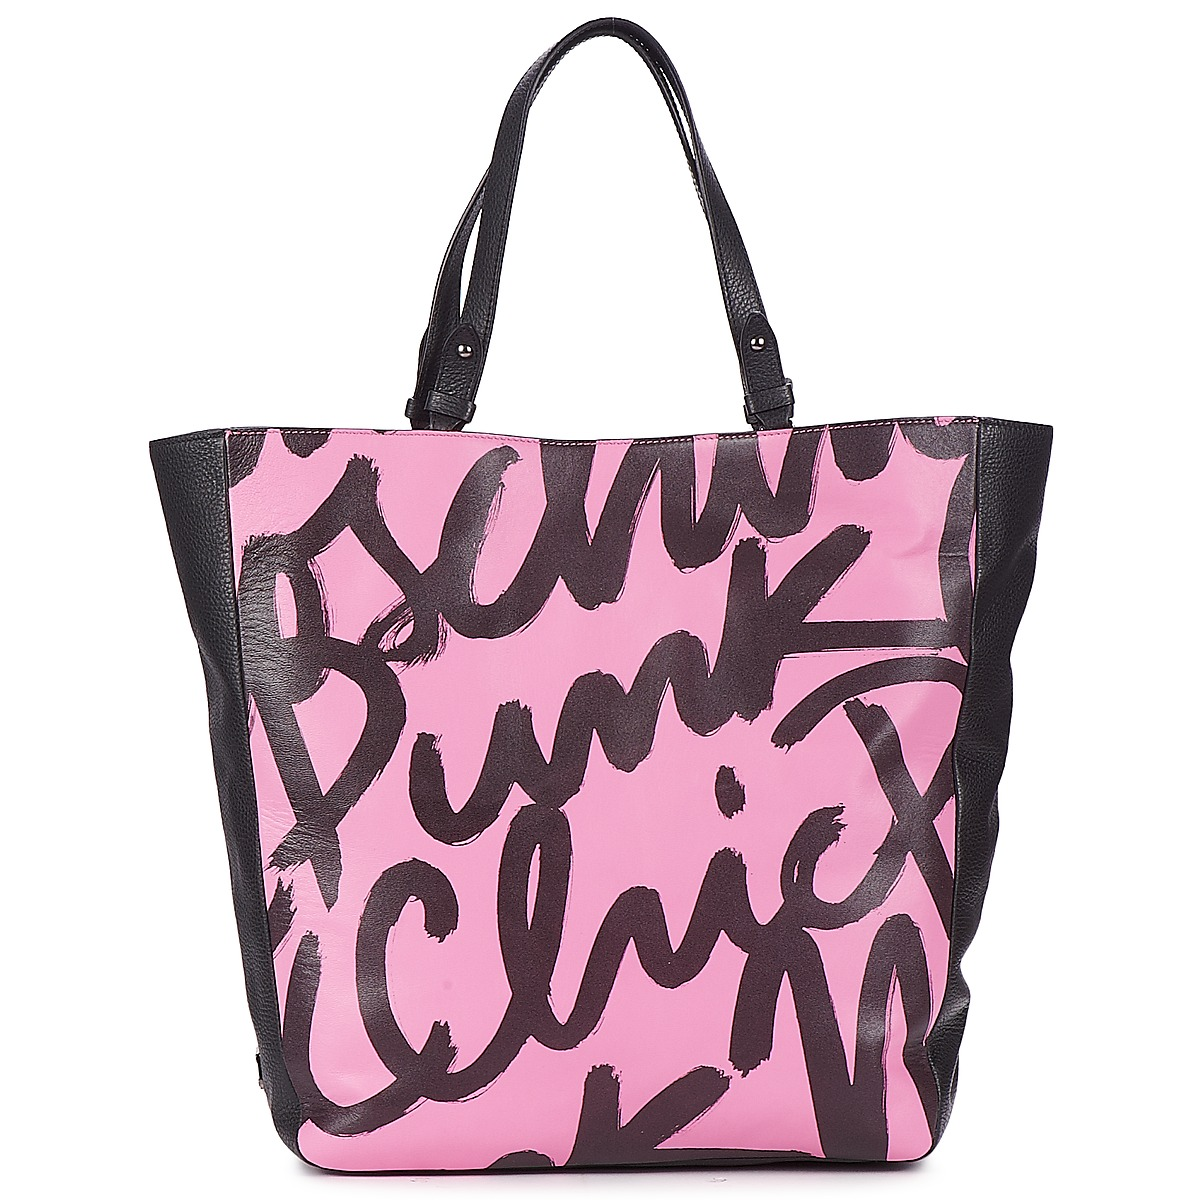 Borsa Shopping donna Moschino Cheap   CHIC  A7527-8001-2221  Rosa